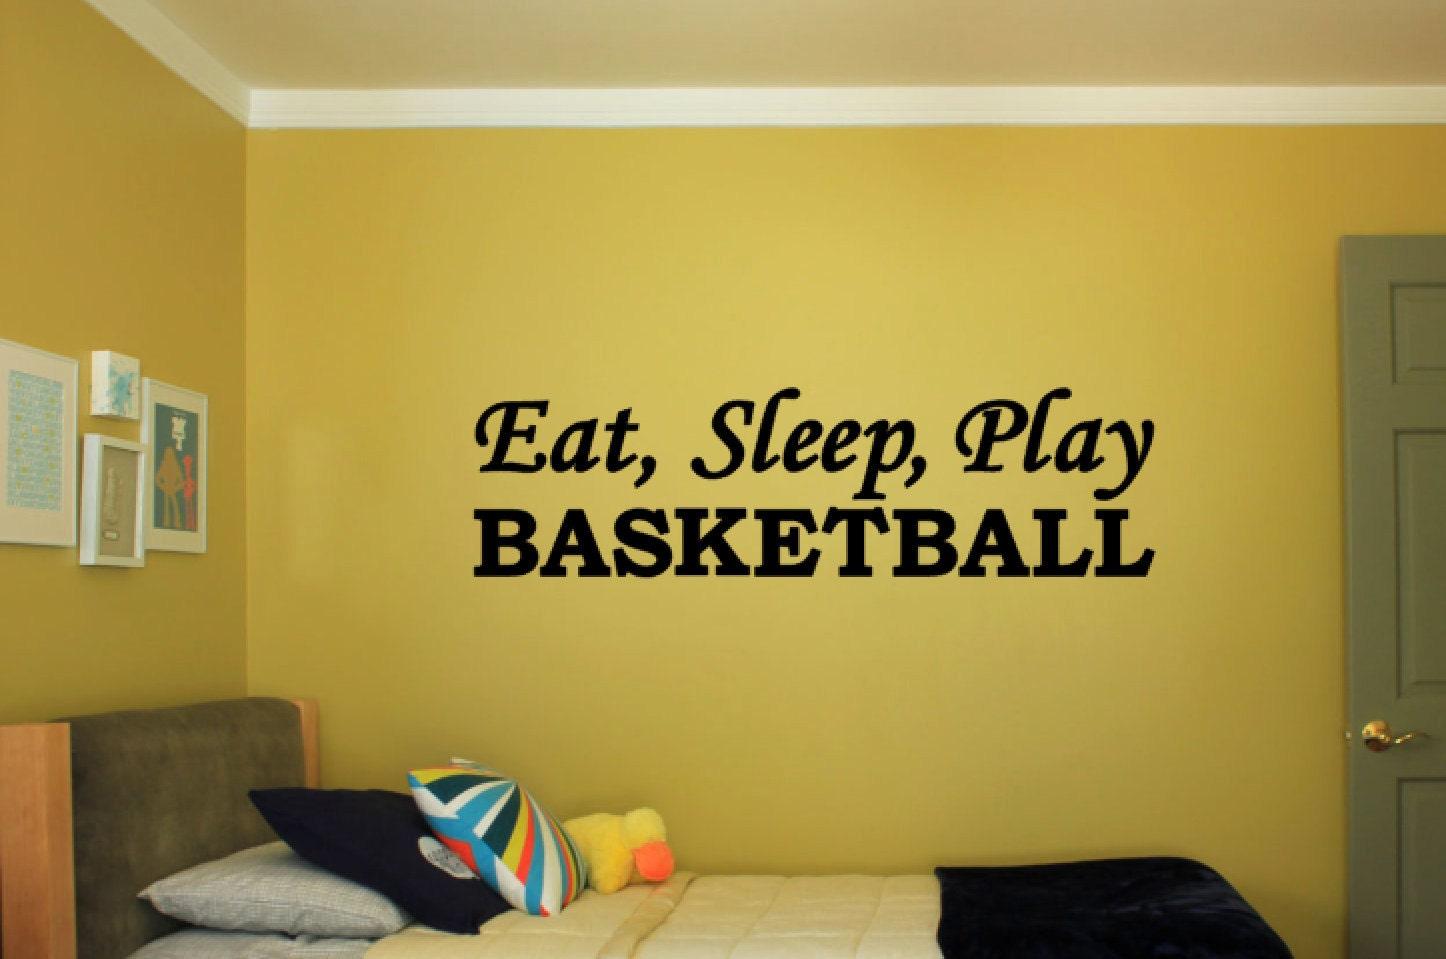 Eat, Sleep, Play BASKETBALL - Vinyl Decal Vinyl Wall Art. Boys or ...